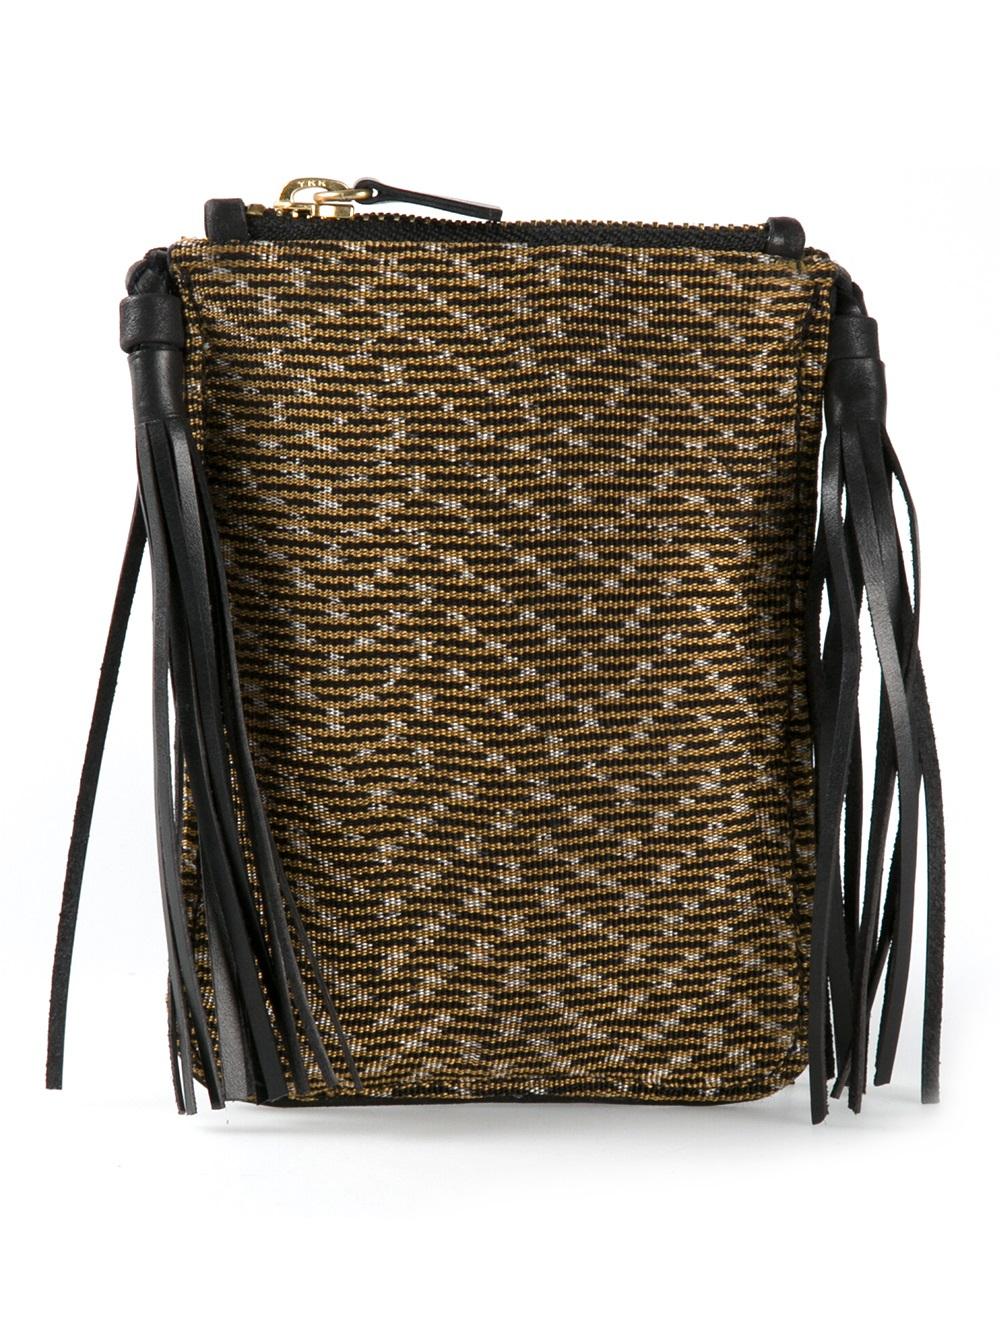 Hacienda Montaecristo 'Liliana' Crossbody Bag in Black